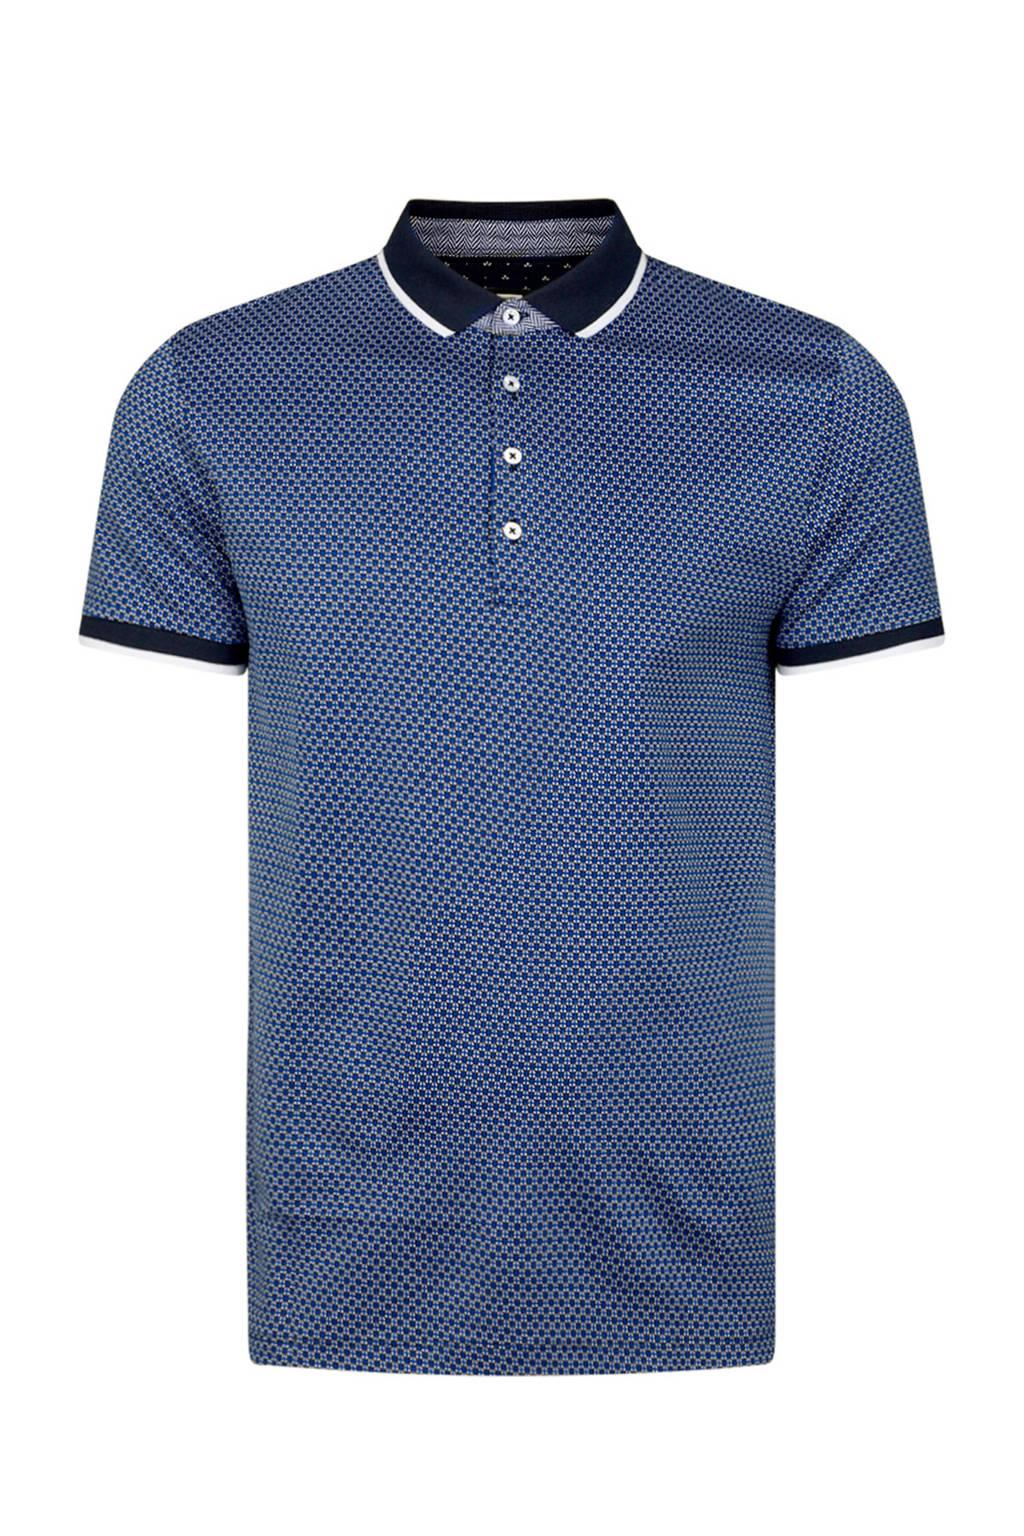 WE Fashion regular fit polo, Donkerblauw